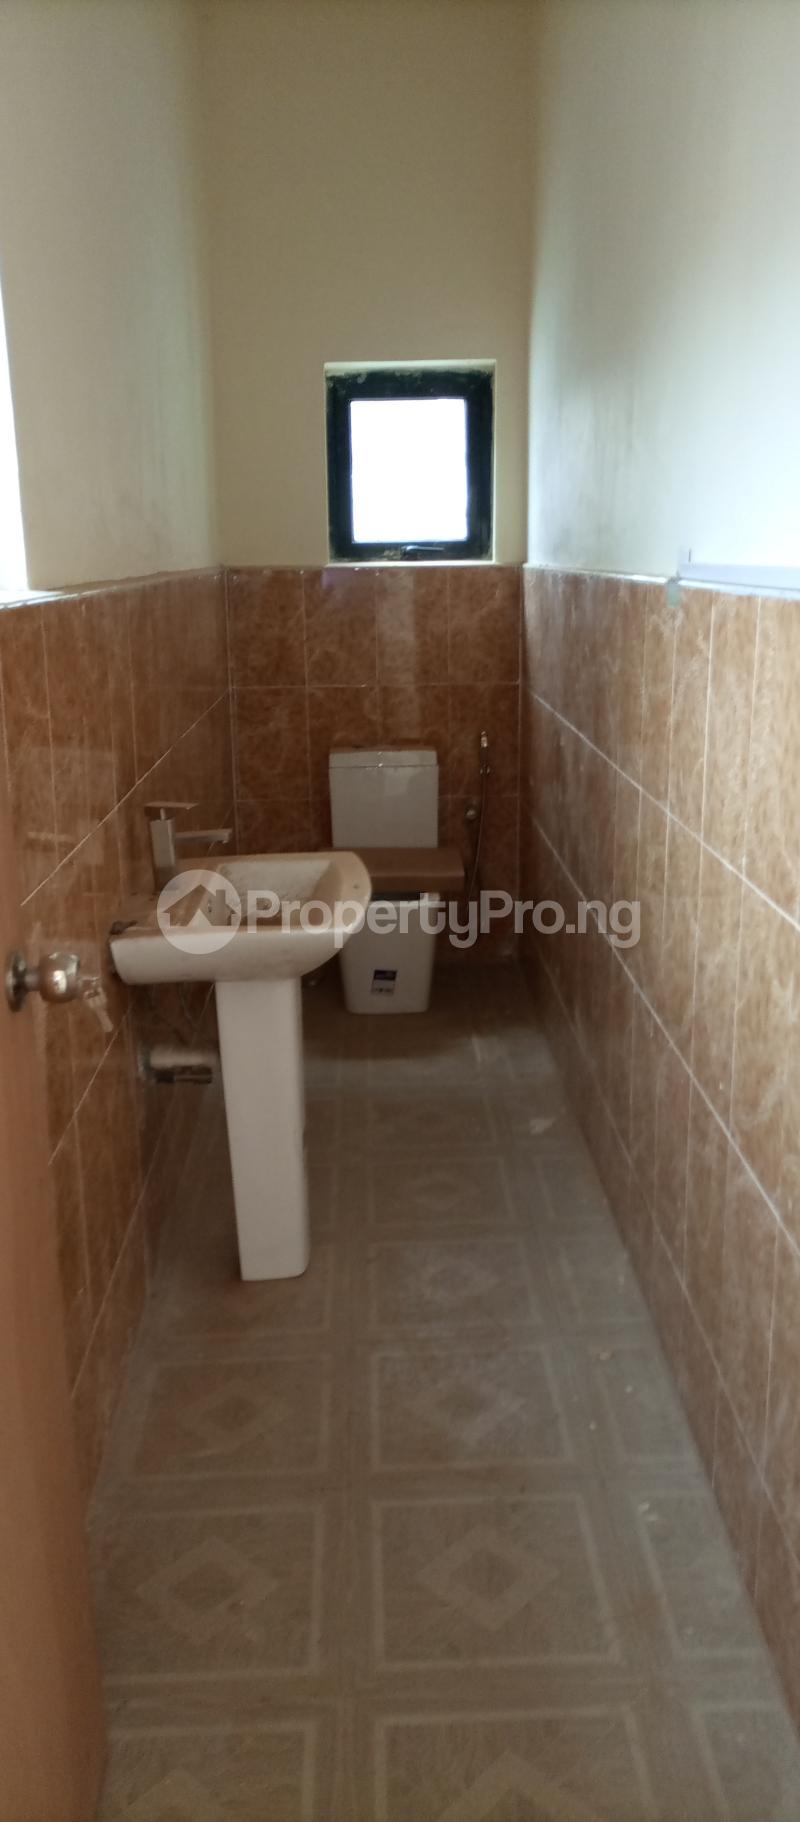 3 bedroom Office Space Commercial Property for rent Abiolaway Abeokuta, Ogun State. Abeokuta Ogun - 2